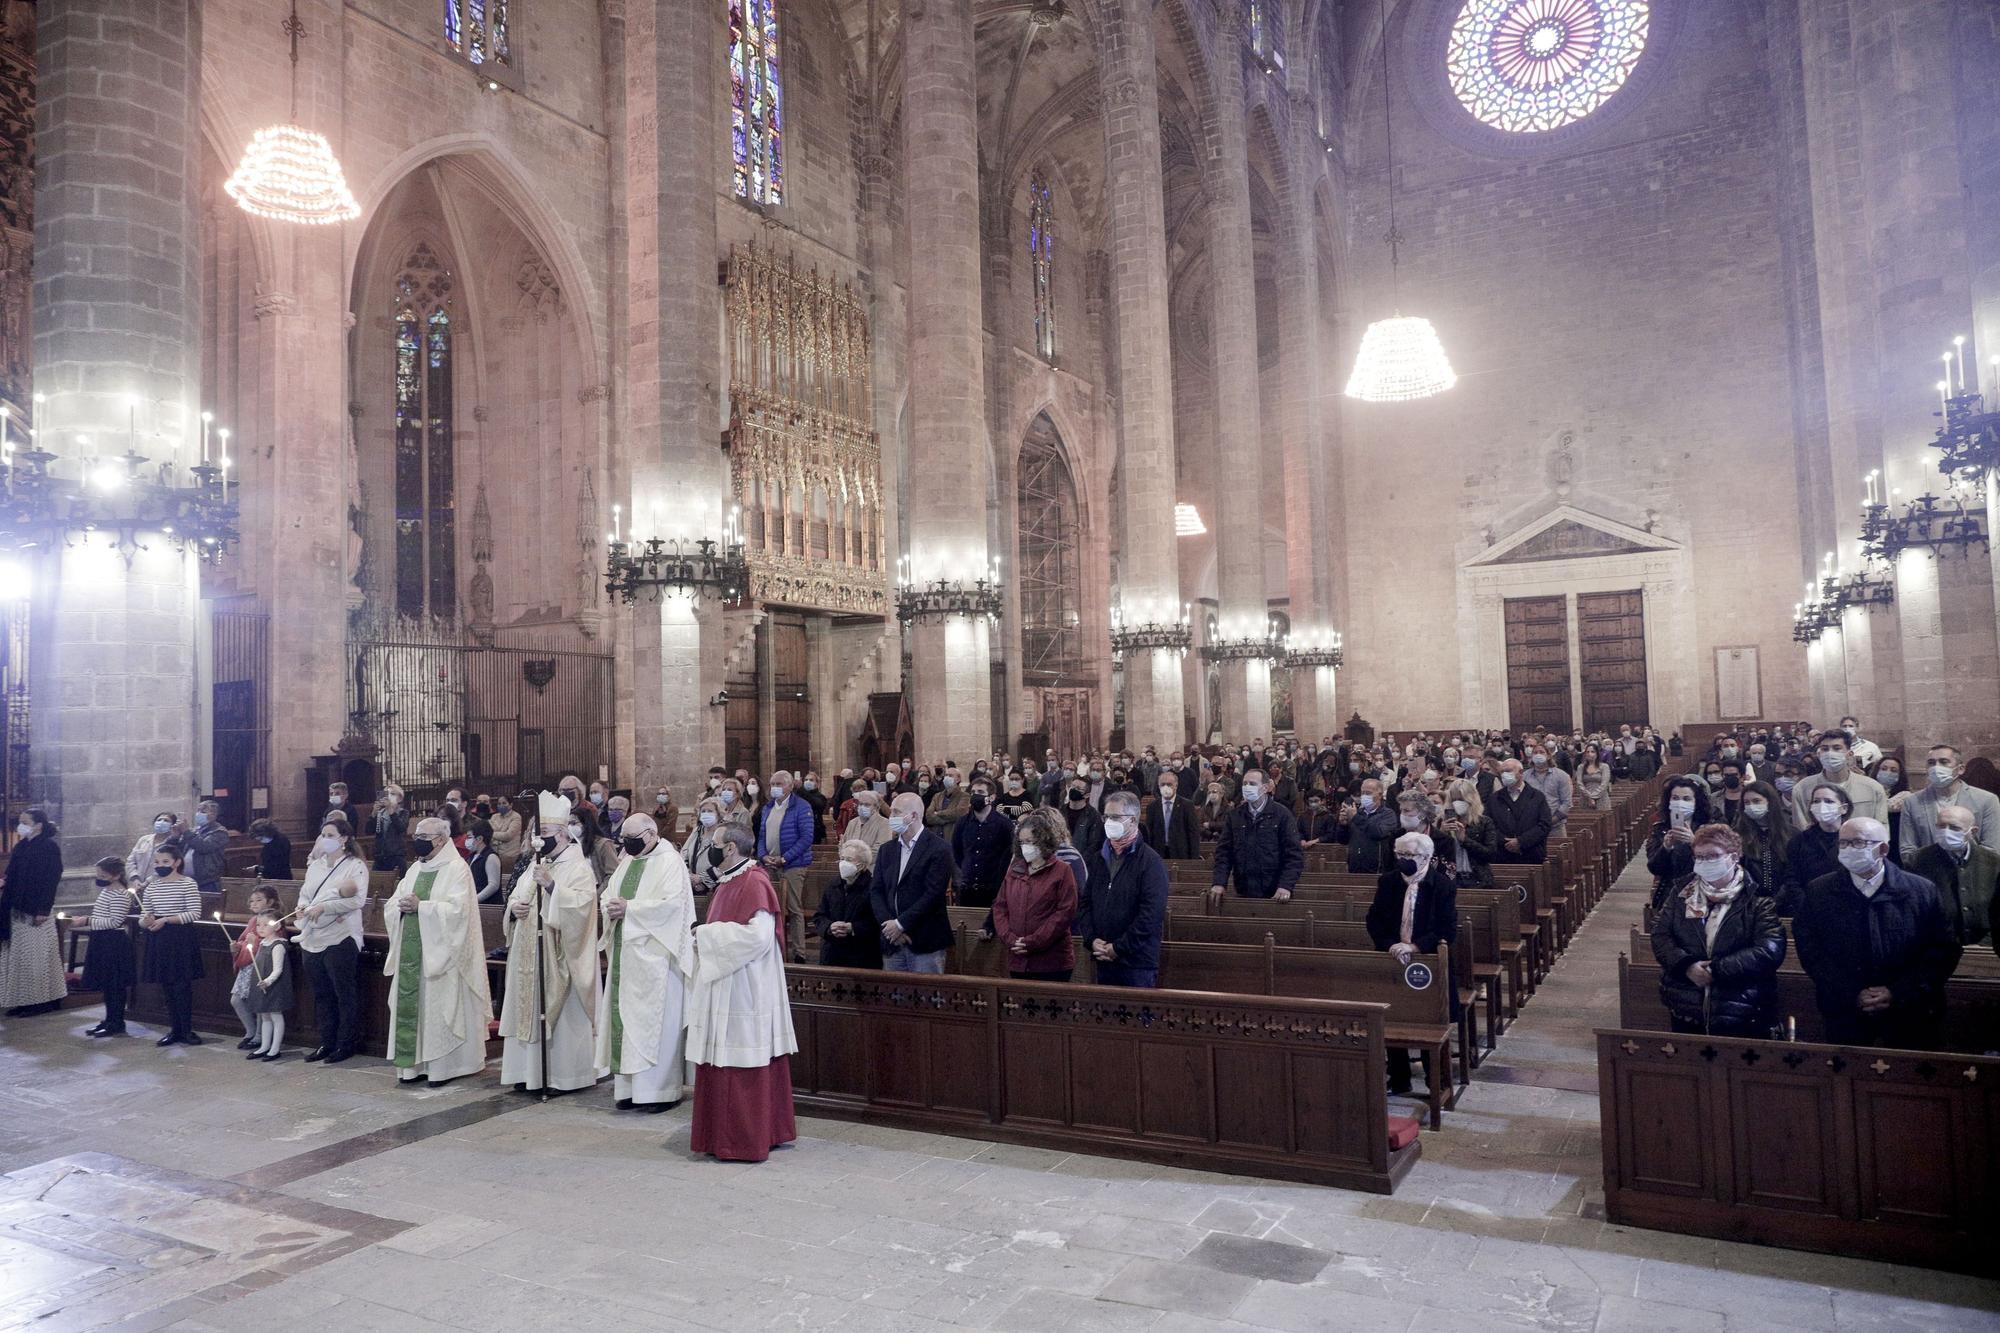 El obispo Taltavull preside la Misa de Pascua en la Catedral